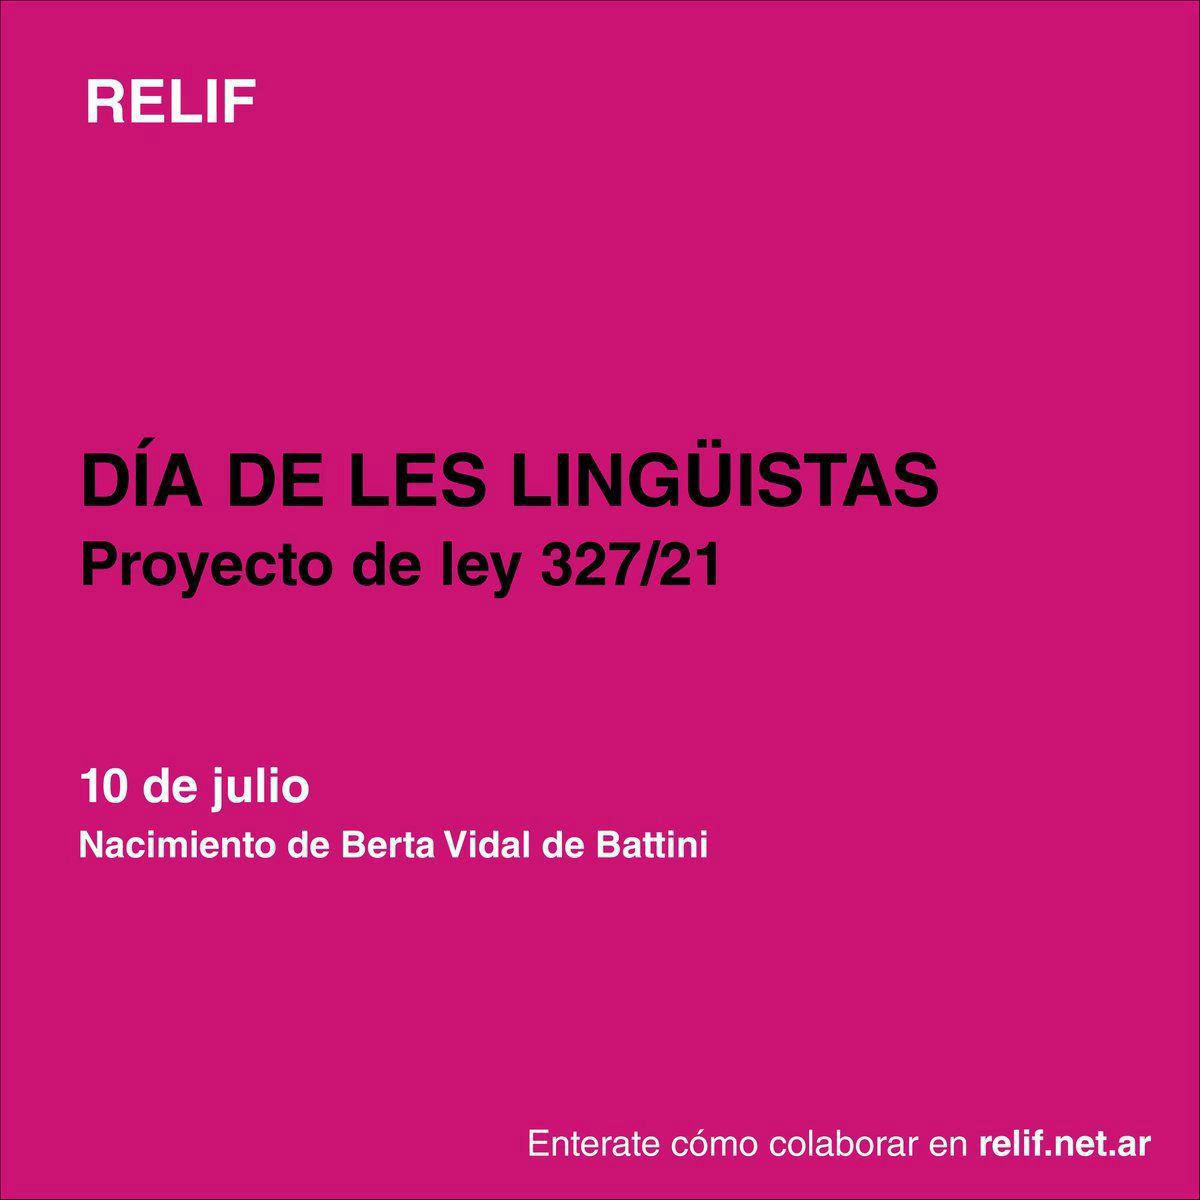 Día de les lingüistas